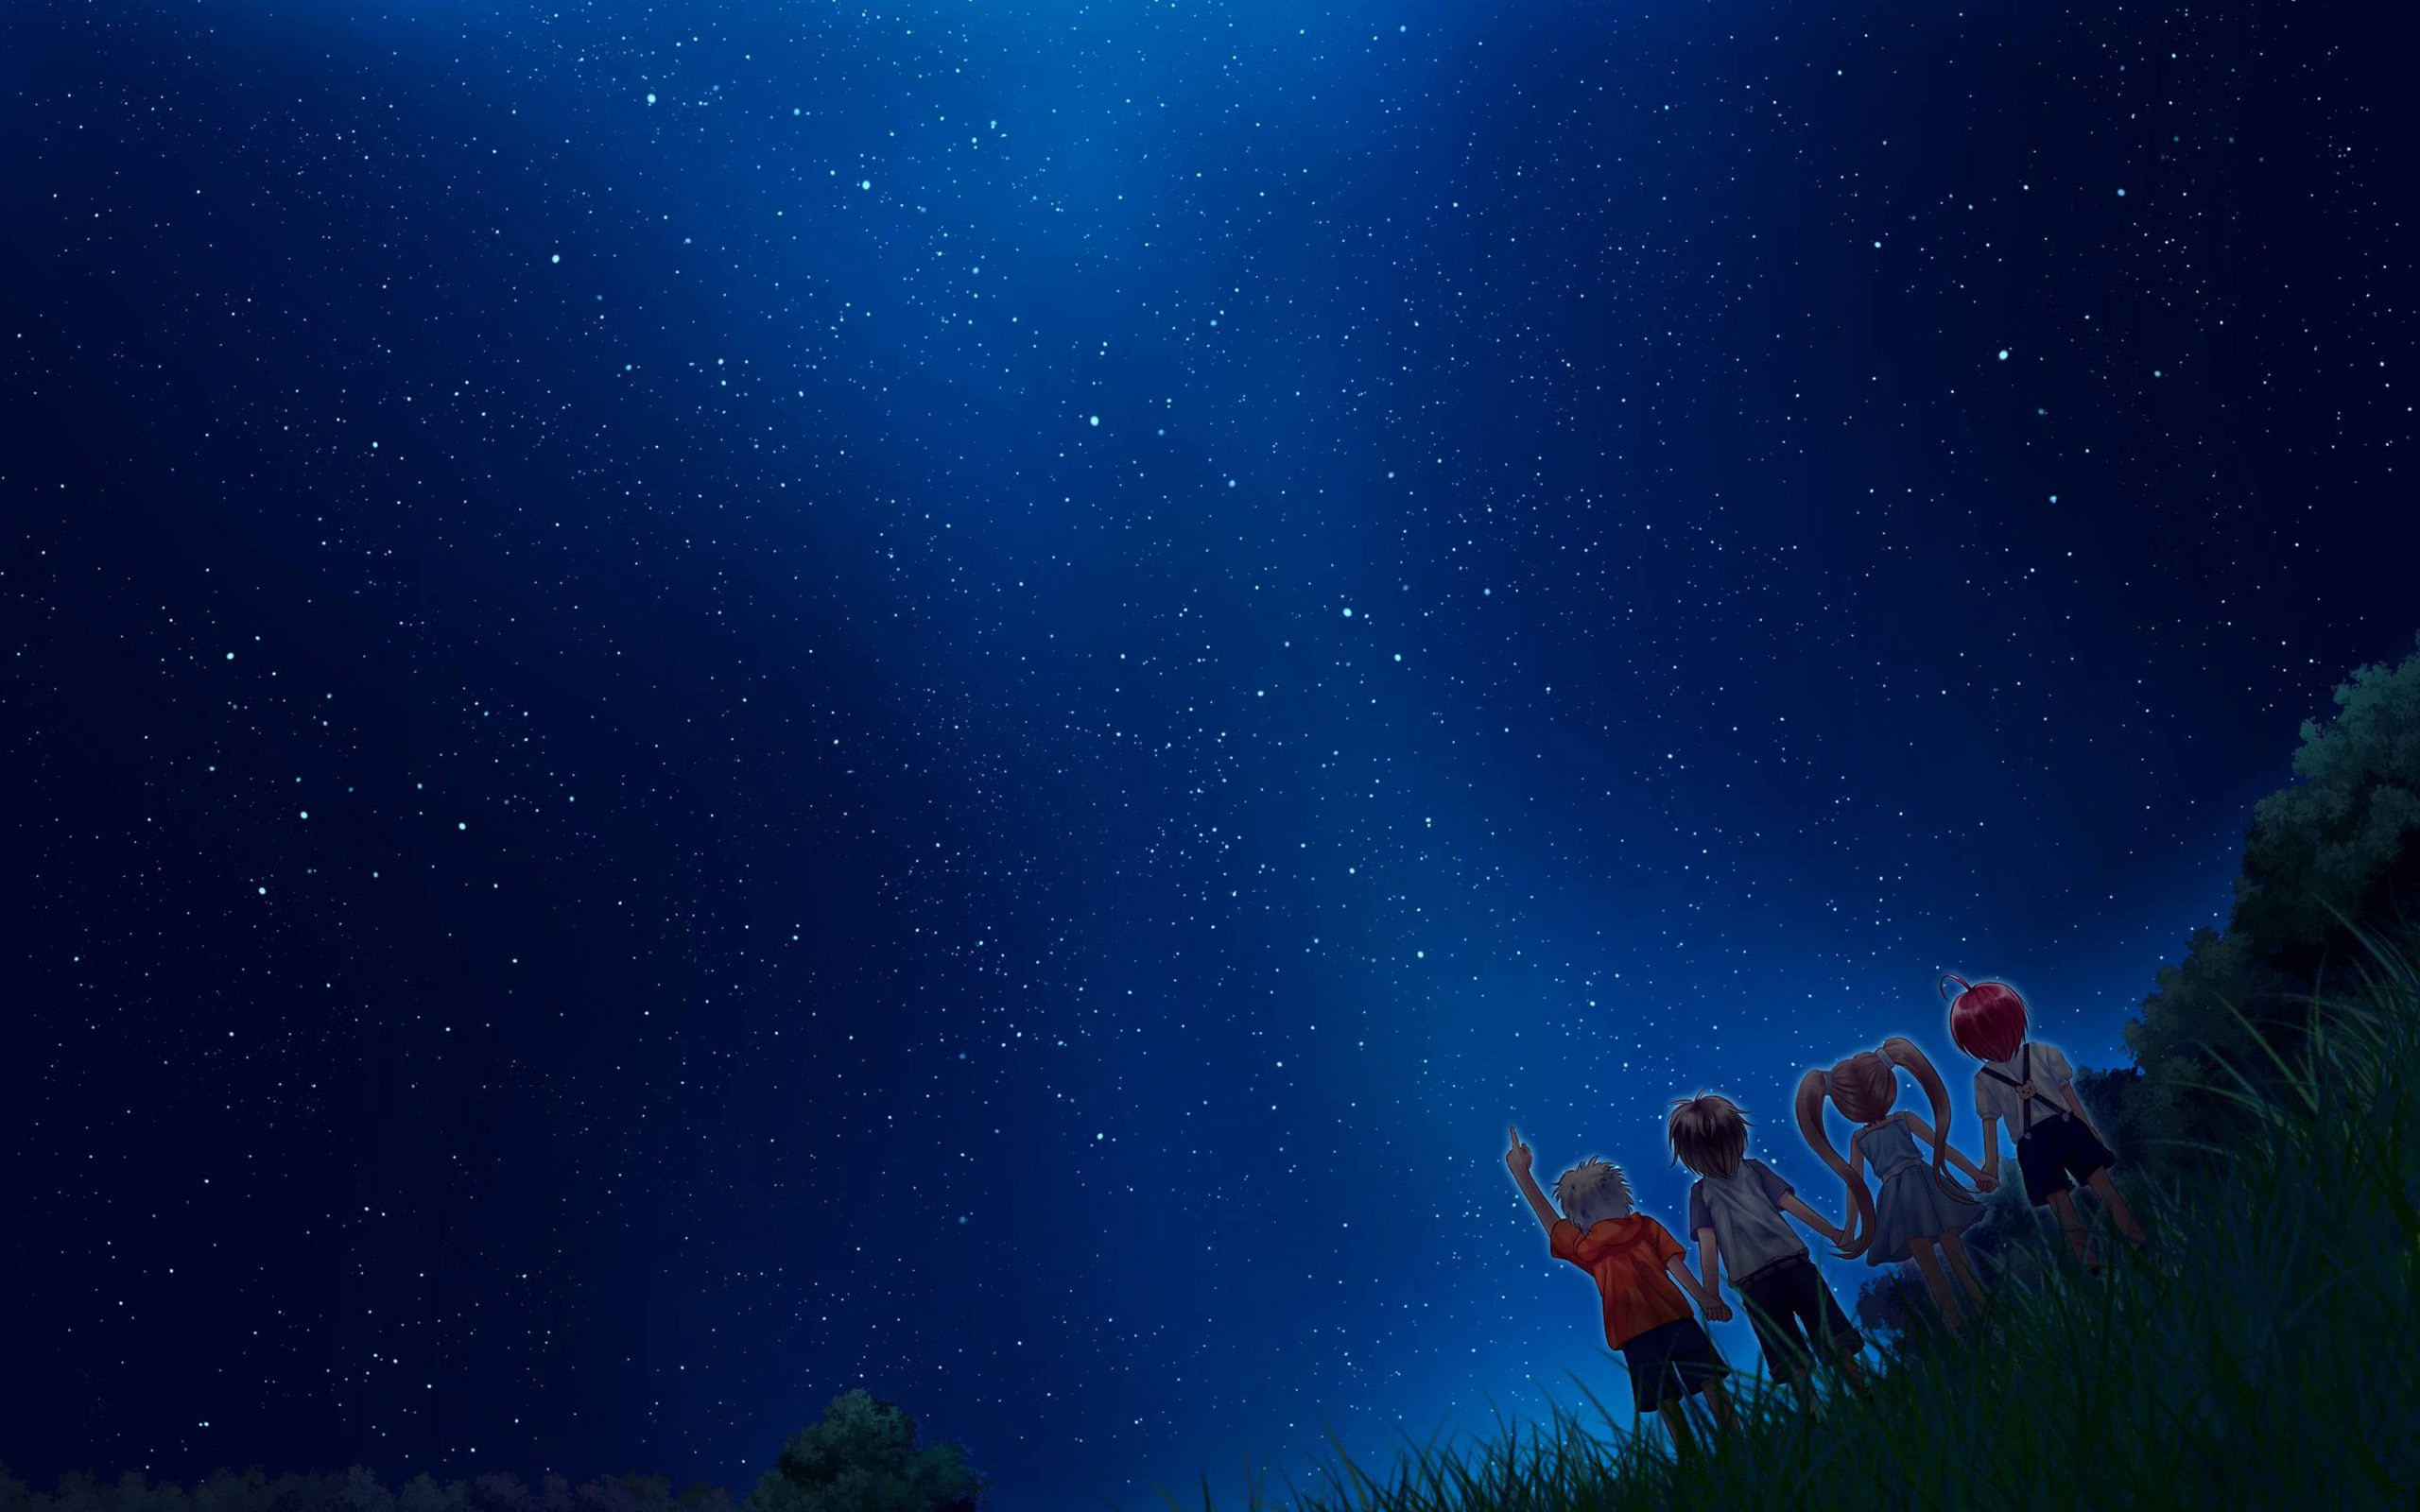 … Starry Sky